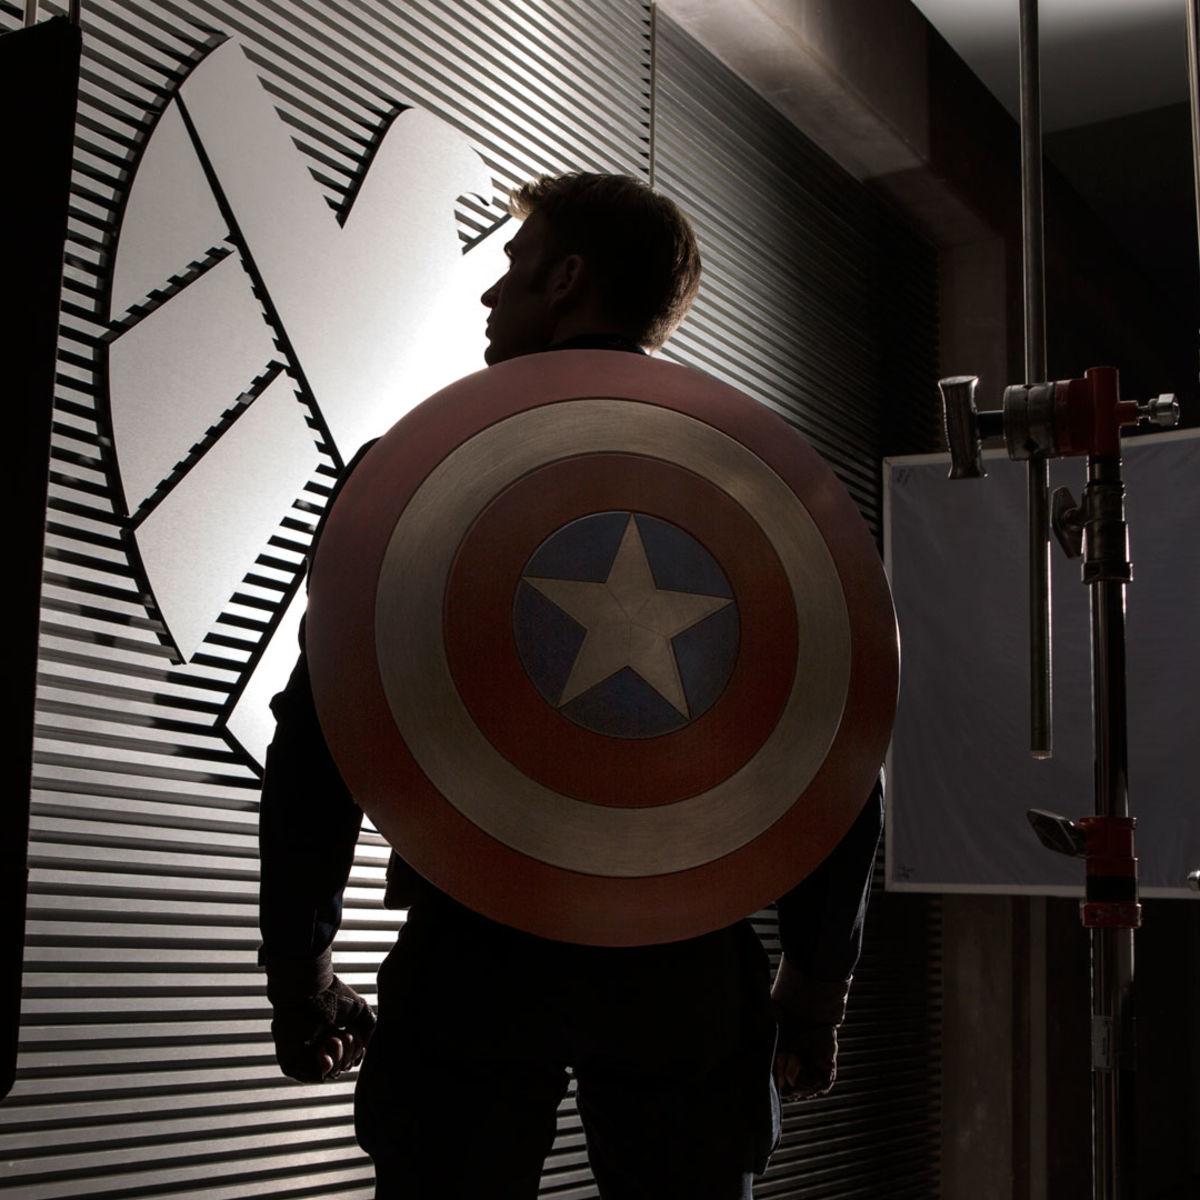 captain-america-2-winter-soldier.jpg